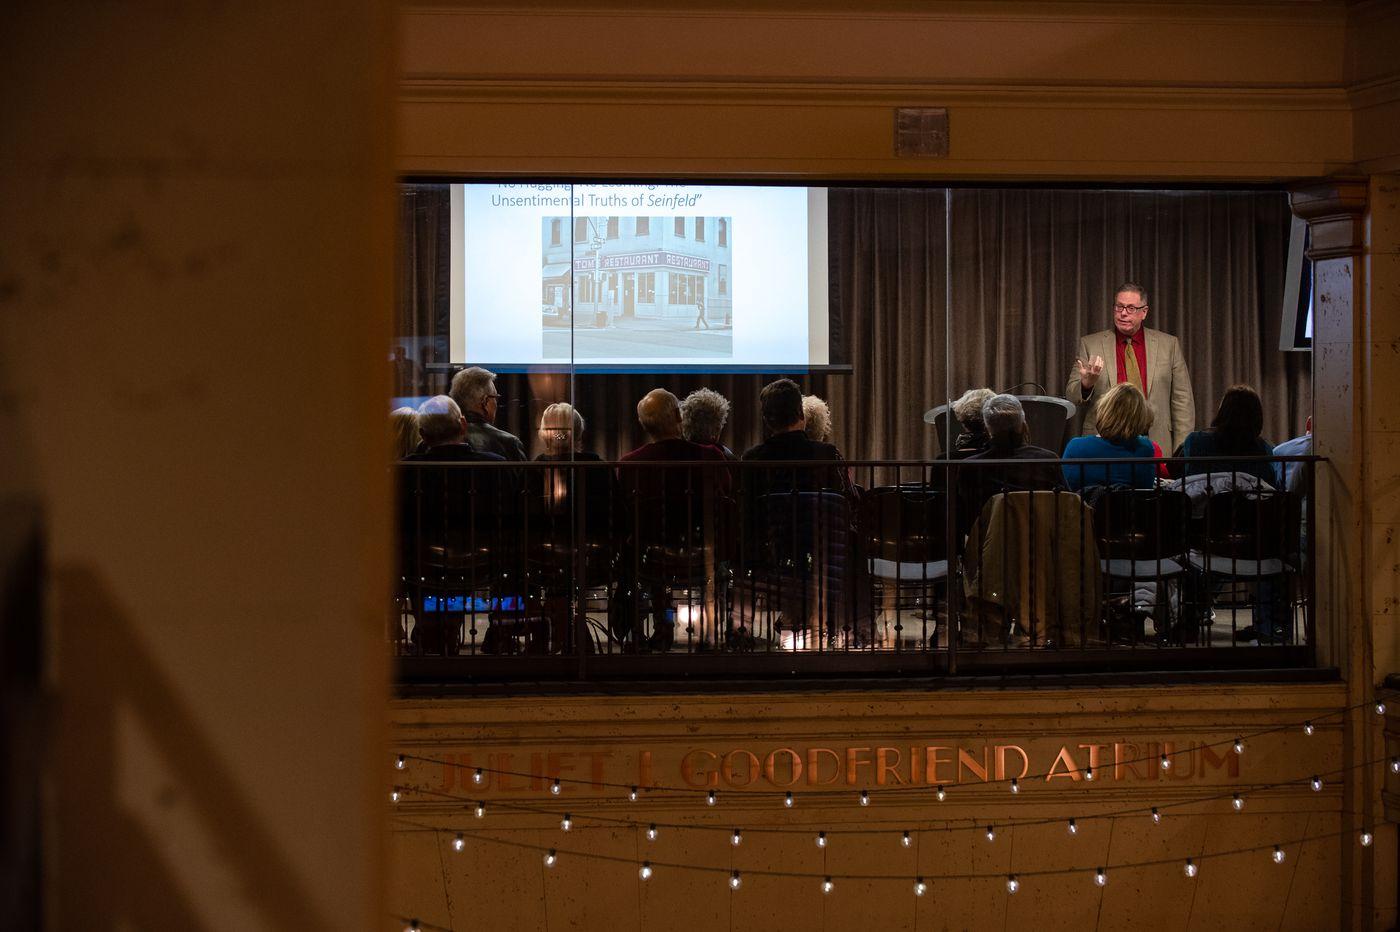 At Bryn Mawr Film Institute, TV on the big screen